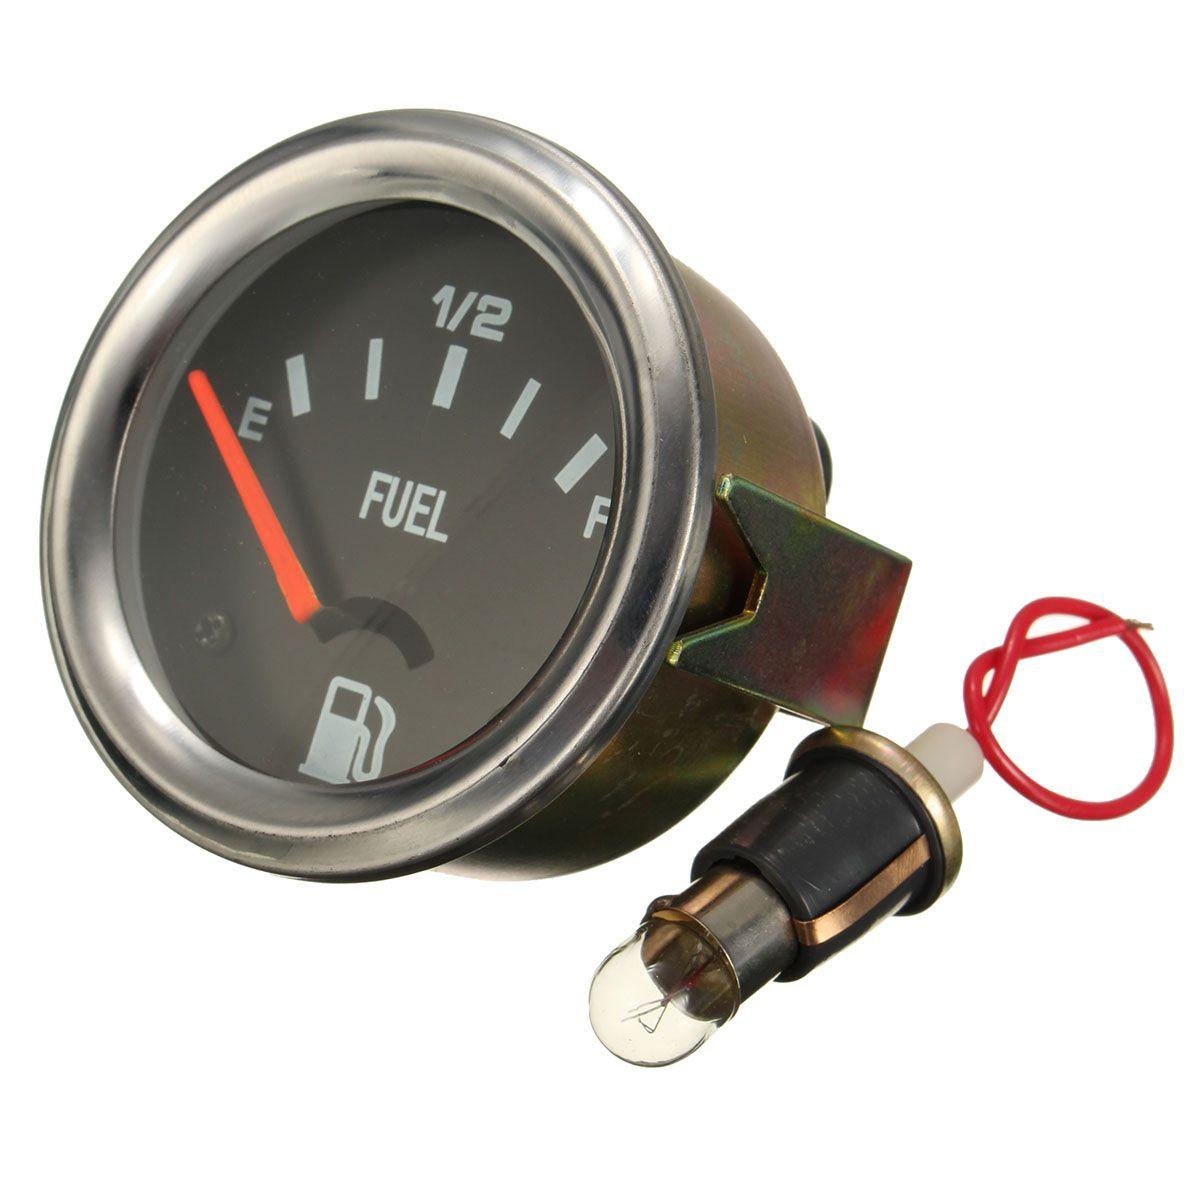 52mm Mechanical Auto Car Fuel Level Gauge Yellow Light Without Sensor E-1/2-F Pointer 12V